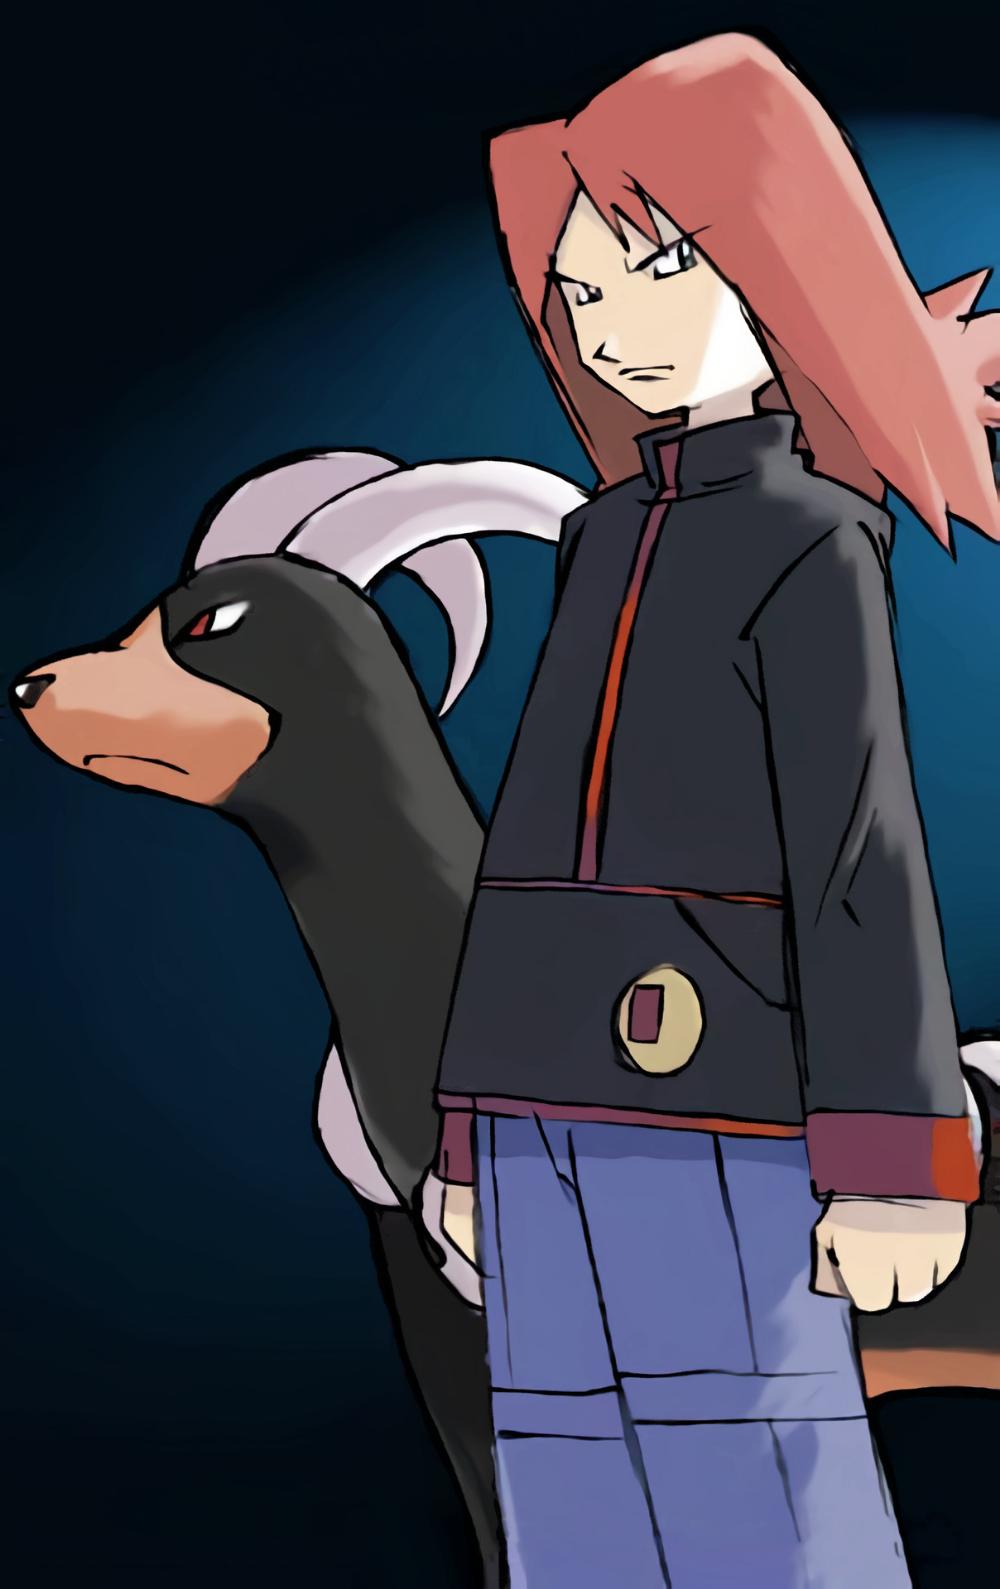 Pin by Calvin Tchorz on Pokémon in 2020 Pokemon art